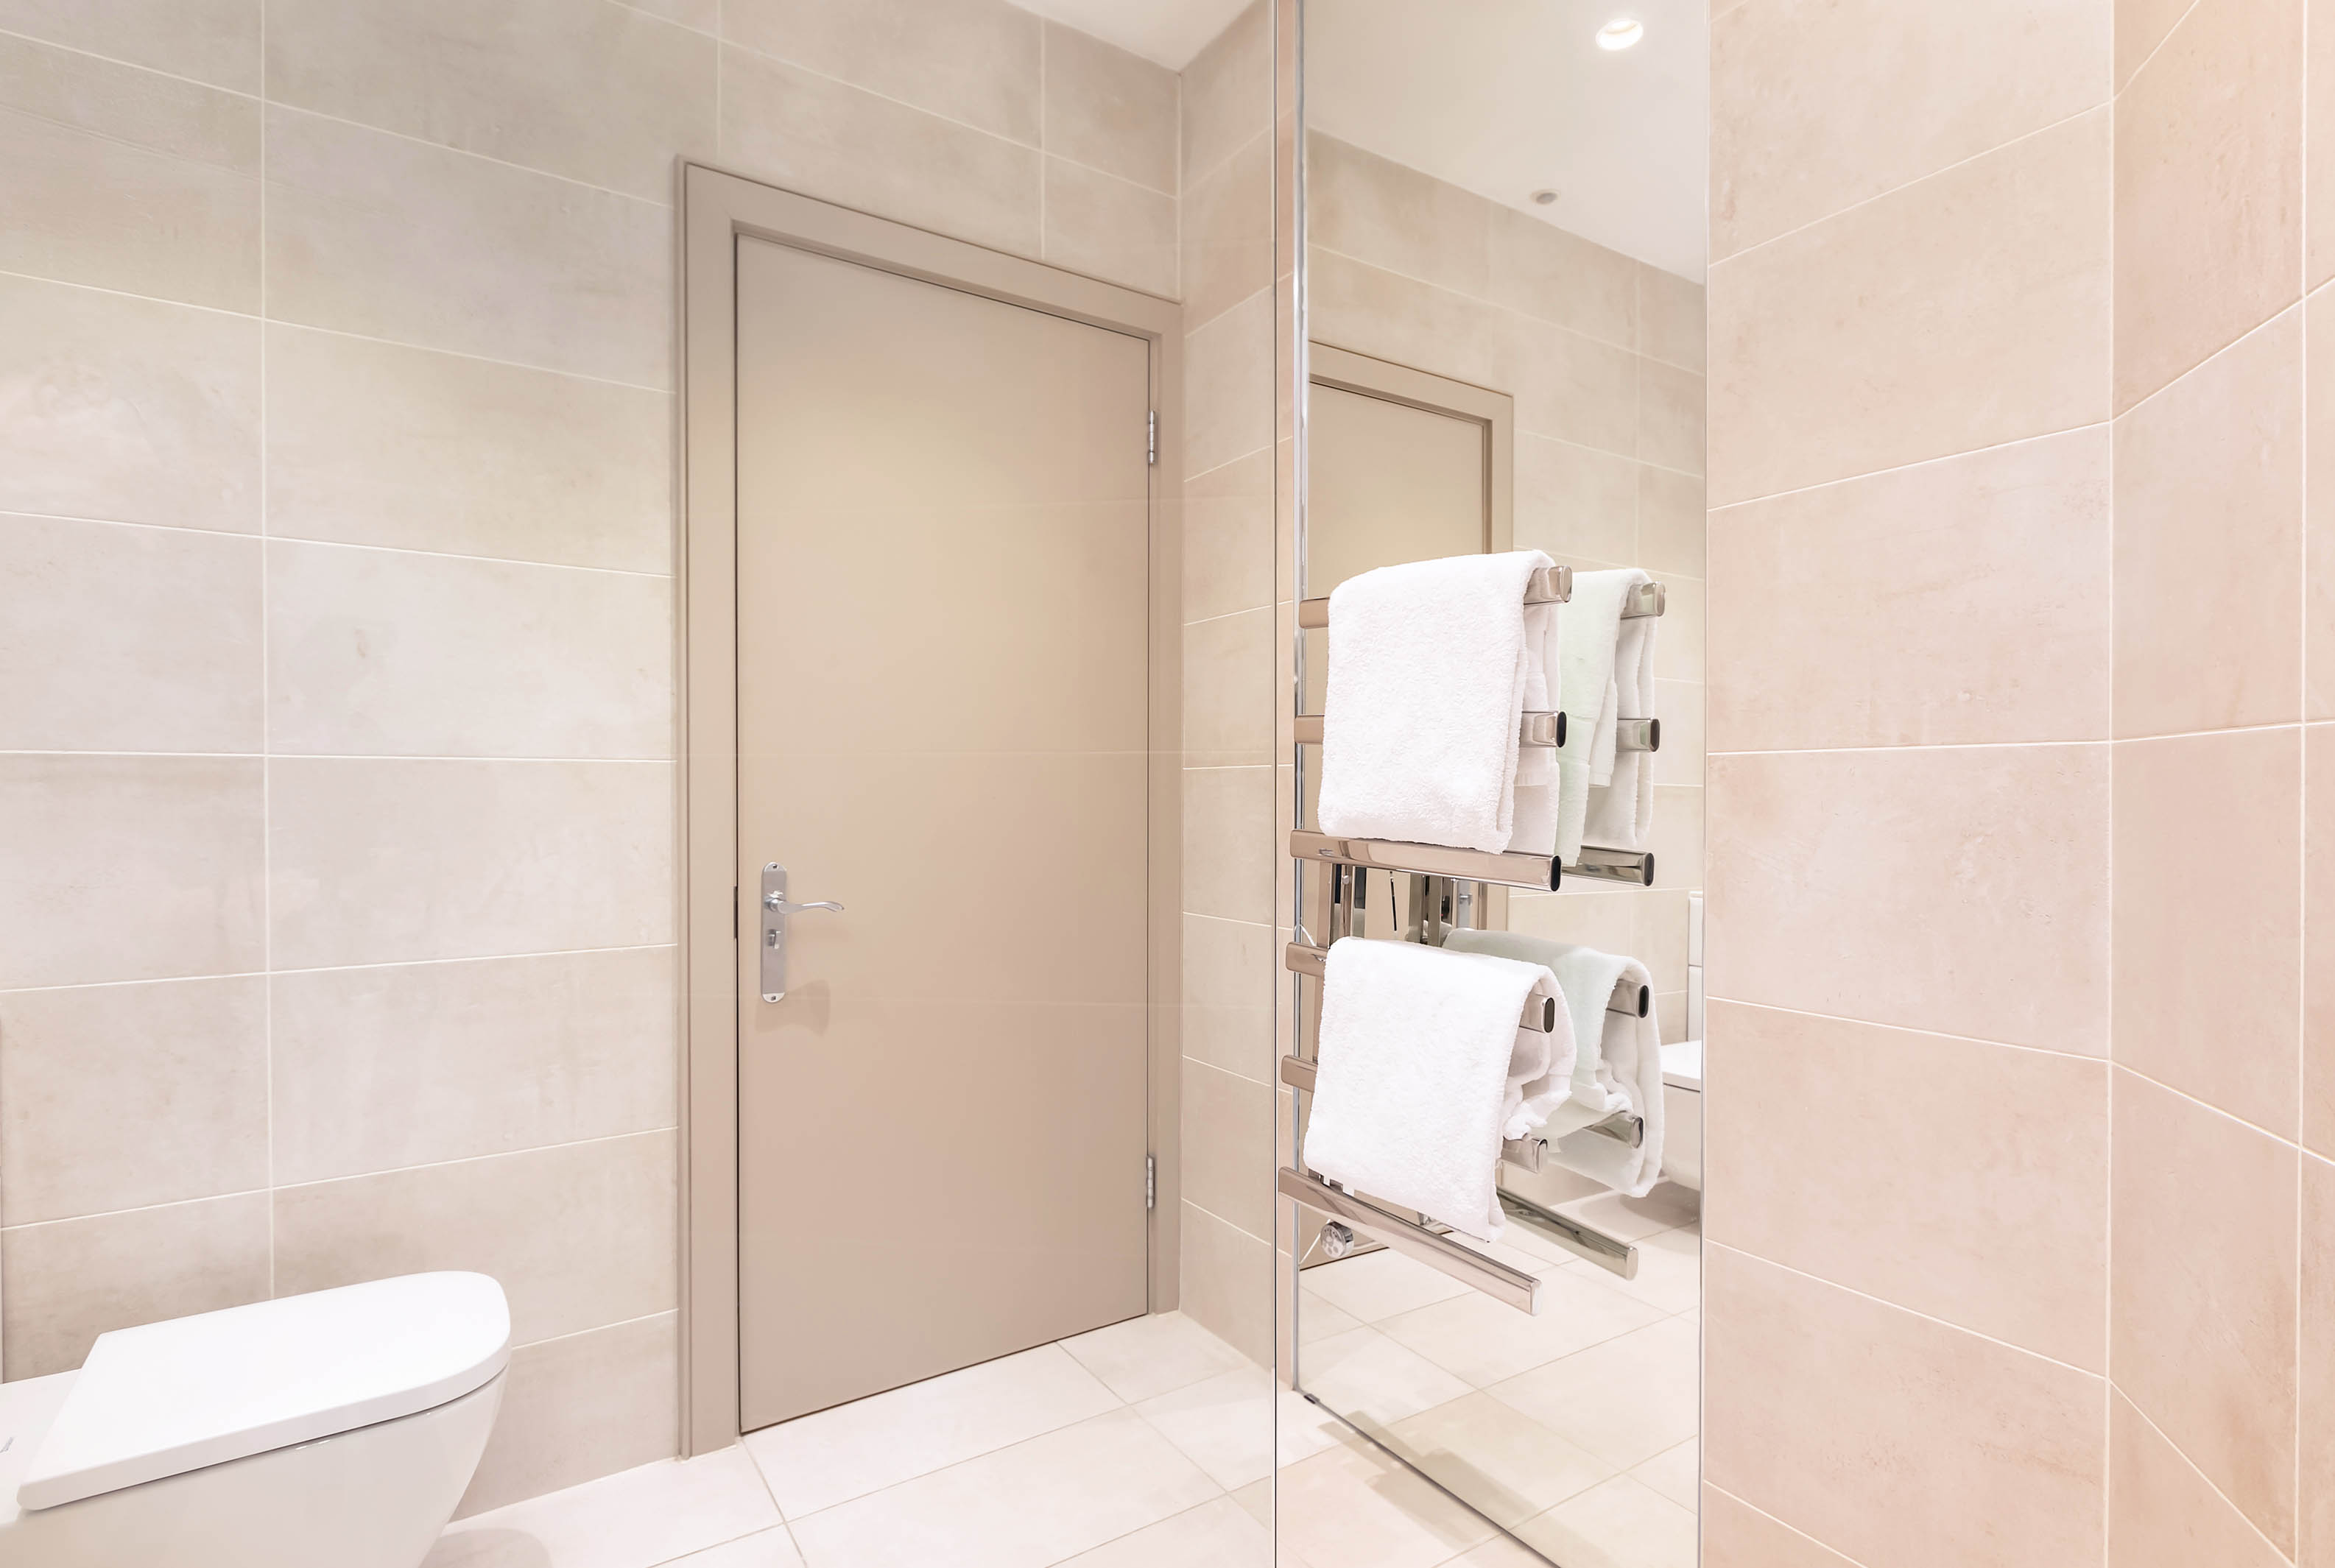 Lovelydays luxury service apartment rental - London - Fitzrovia - Wells Mews B - Lovelysuite - 2 bedrooms - 2 bathrooms - Lovely shower - c7a5eb1187ba - Lovelydays